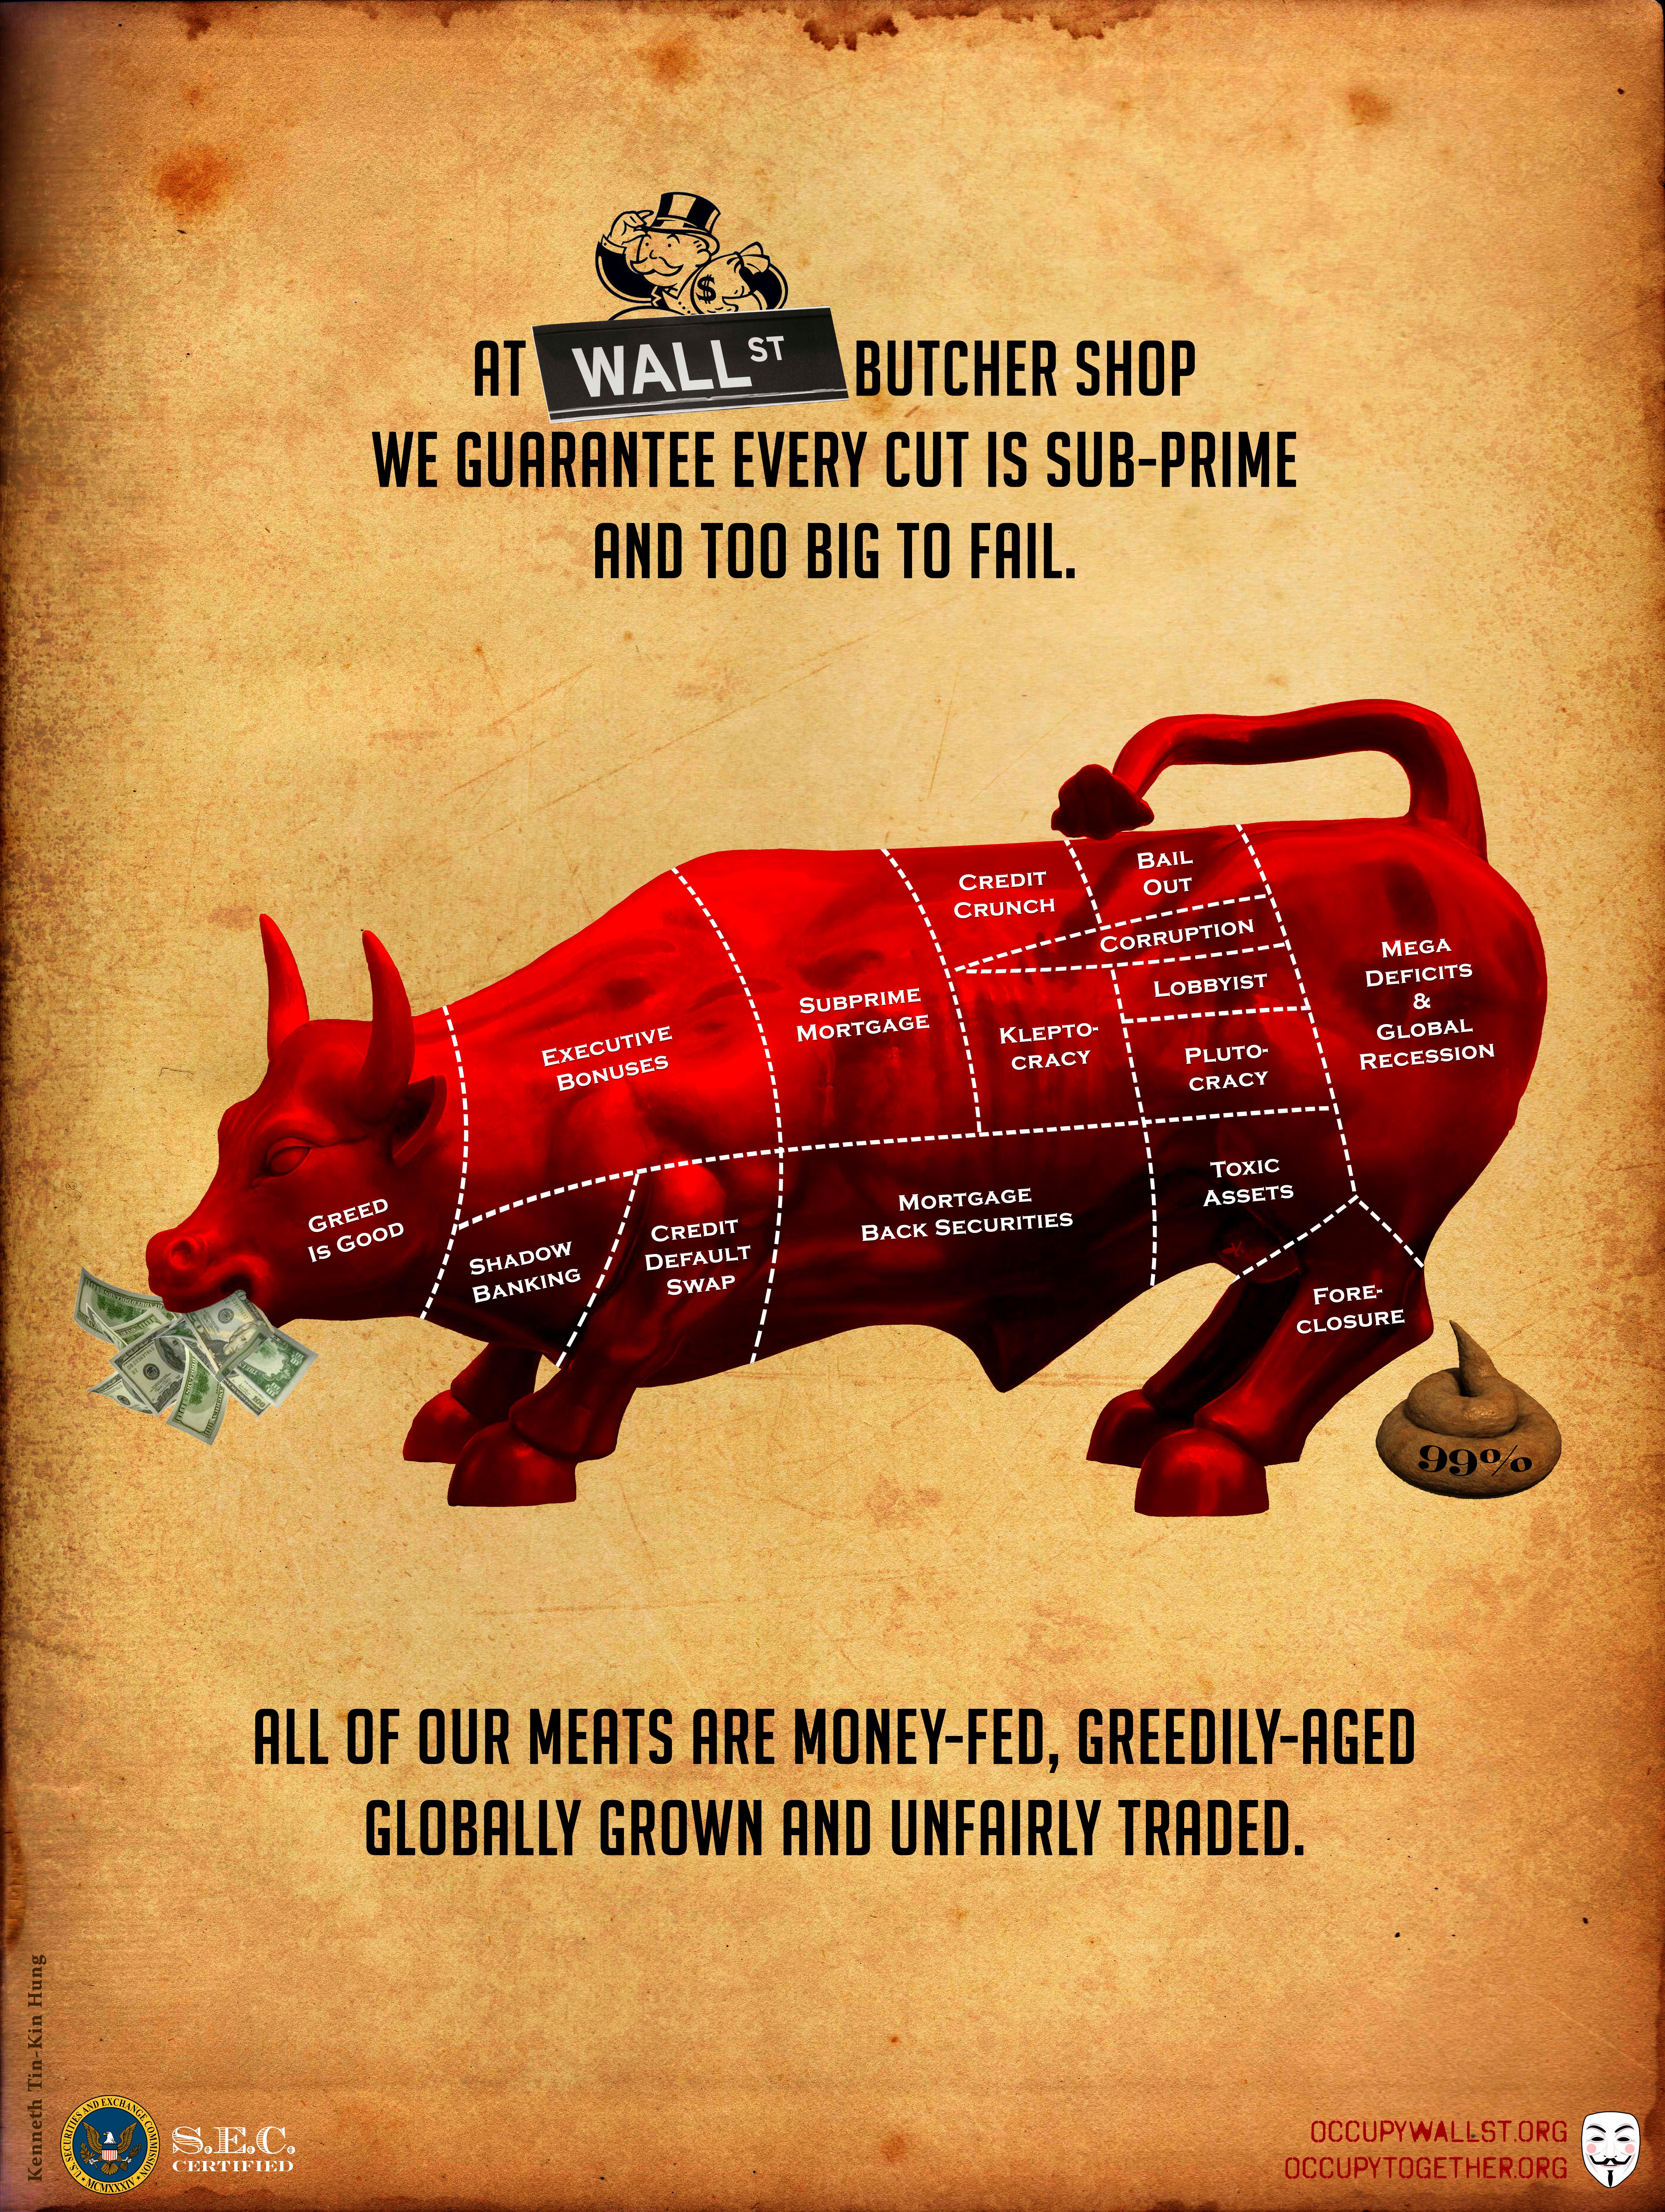 Occupy Wall Street Posters » KENNETH TIN-KIN HUNG » Kenneth Tin-Kin Hung